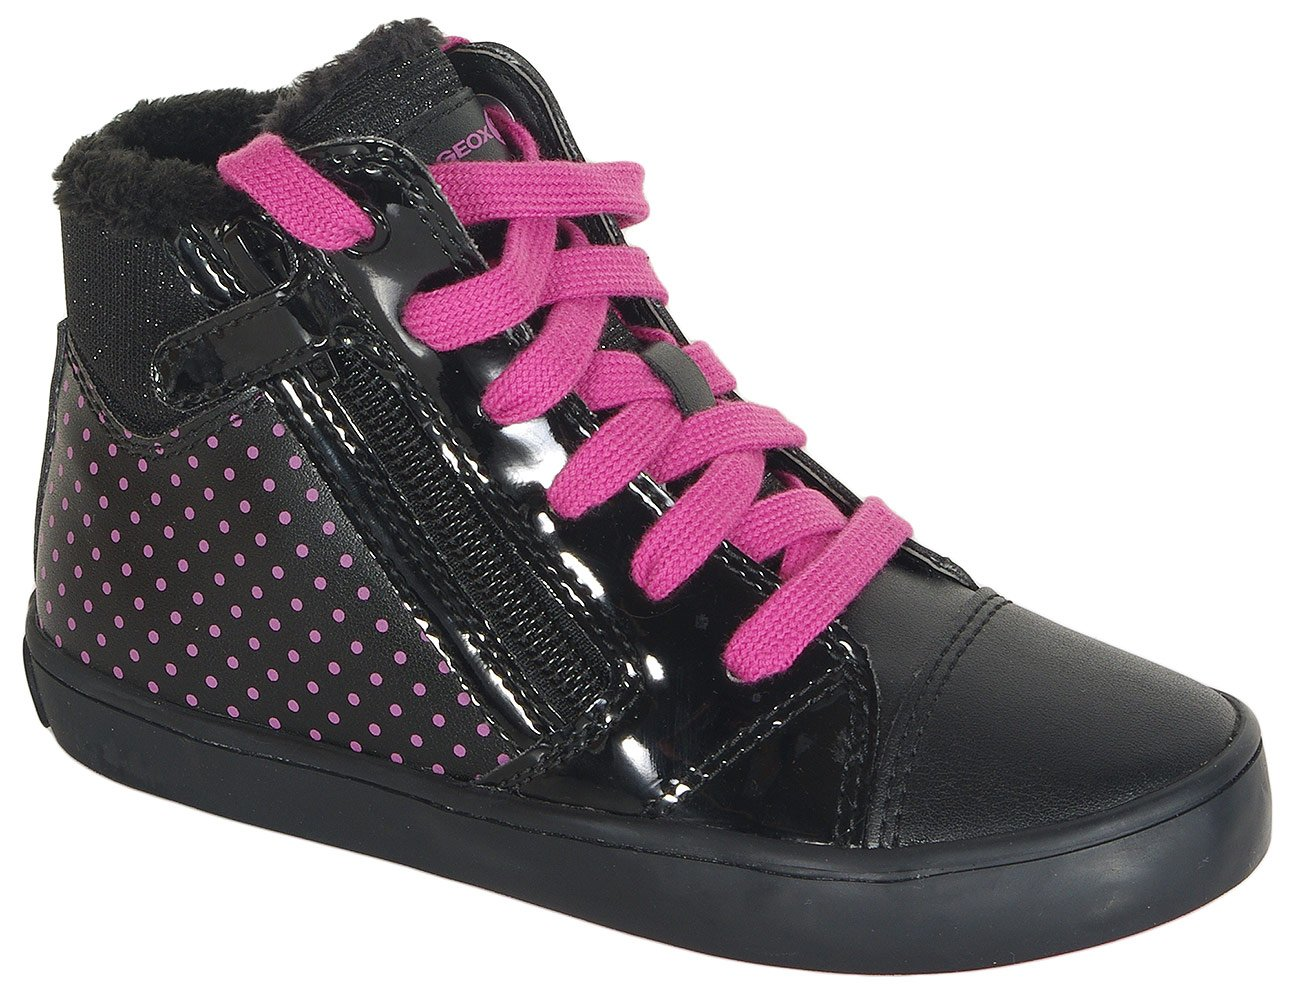 GEOX Gisli B sneakers GBK girl black